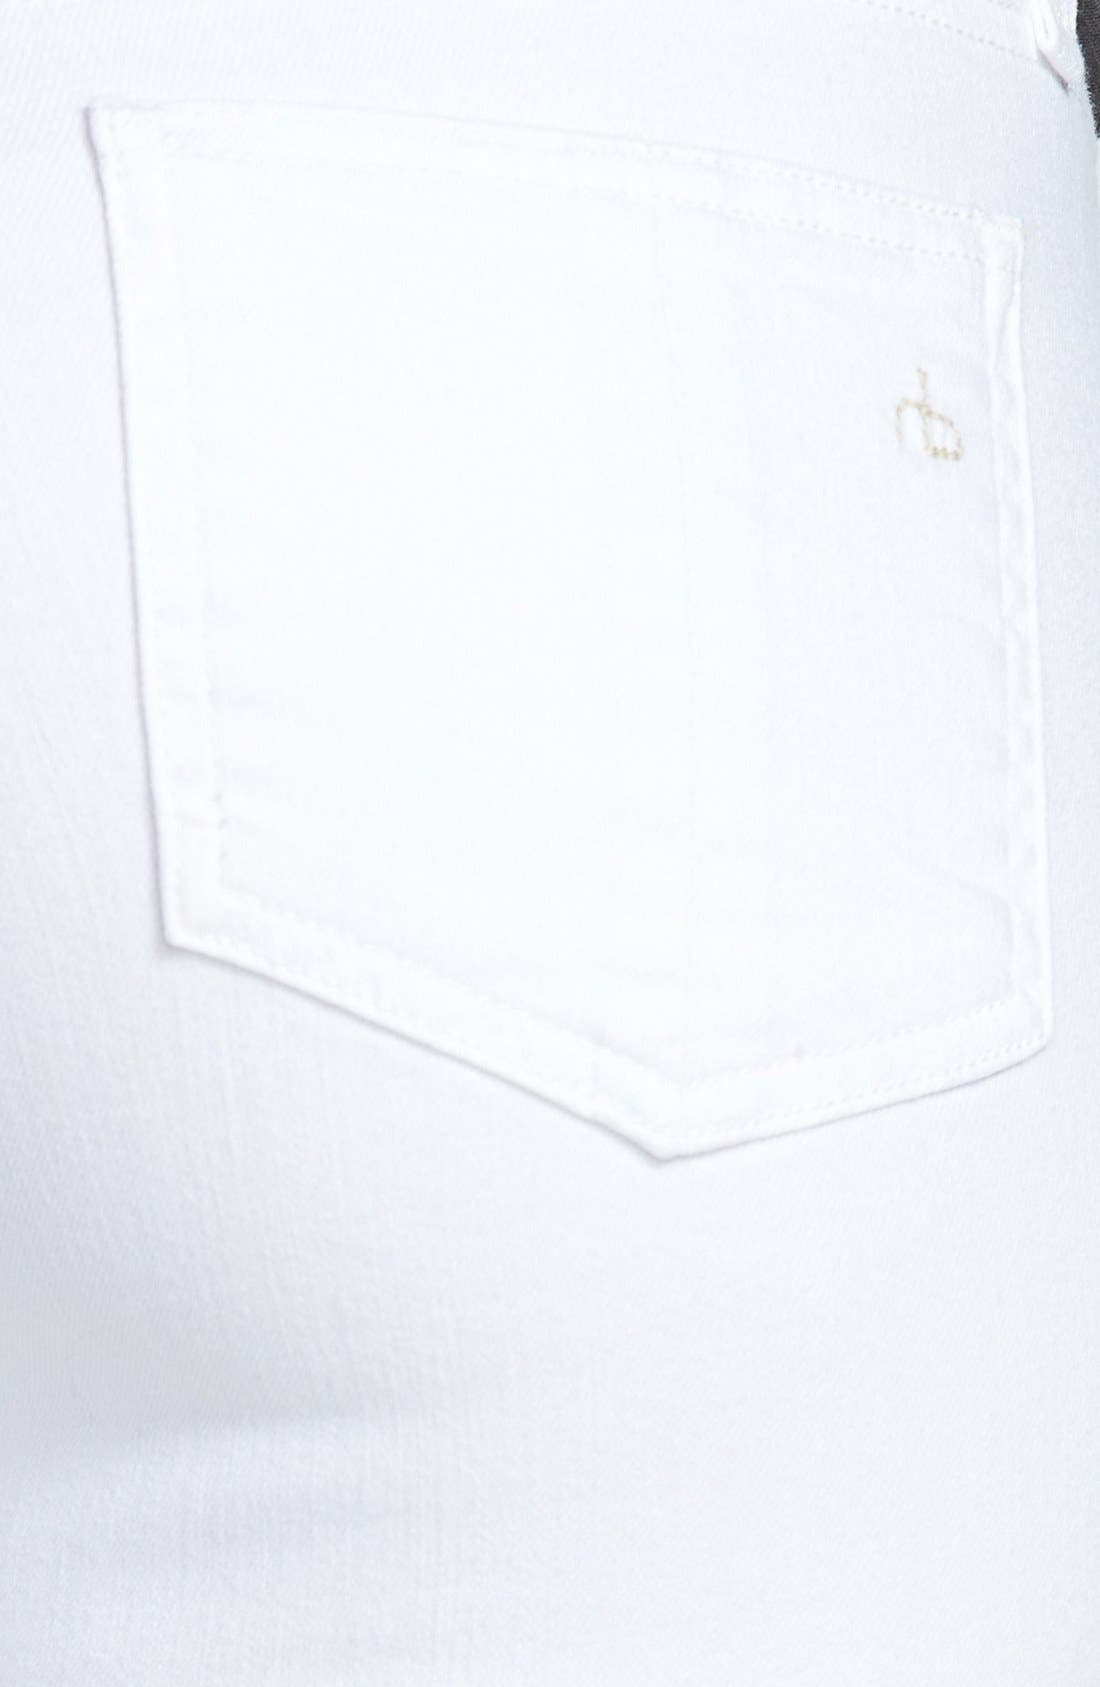 Alternate Image 3  - rag & bone/JEAN 'Repair' Skinny Crop Jeans (Bright White)